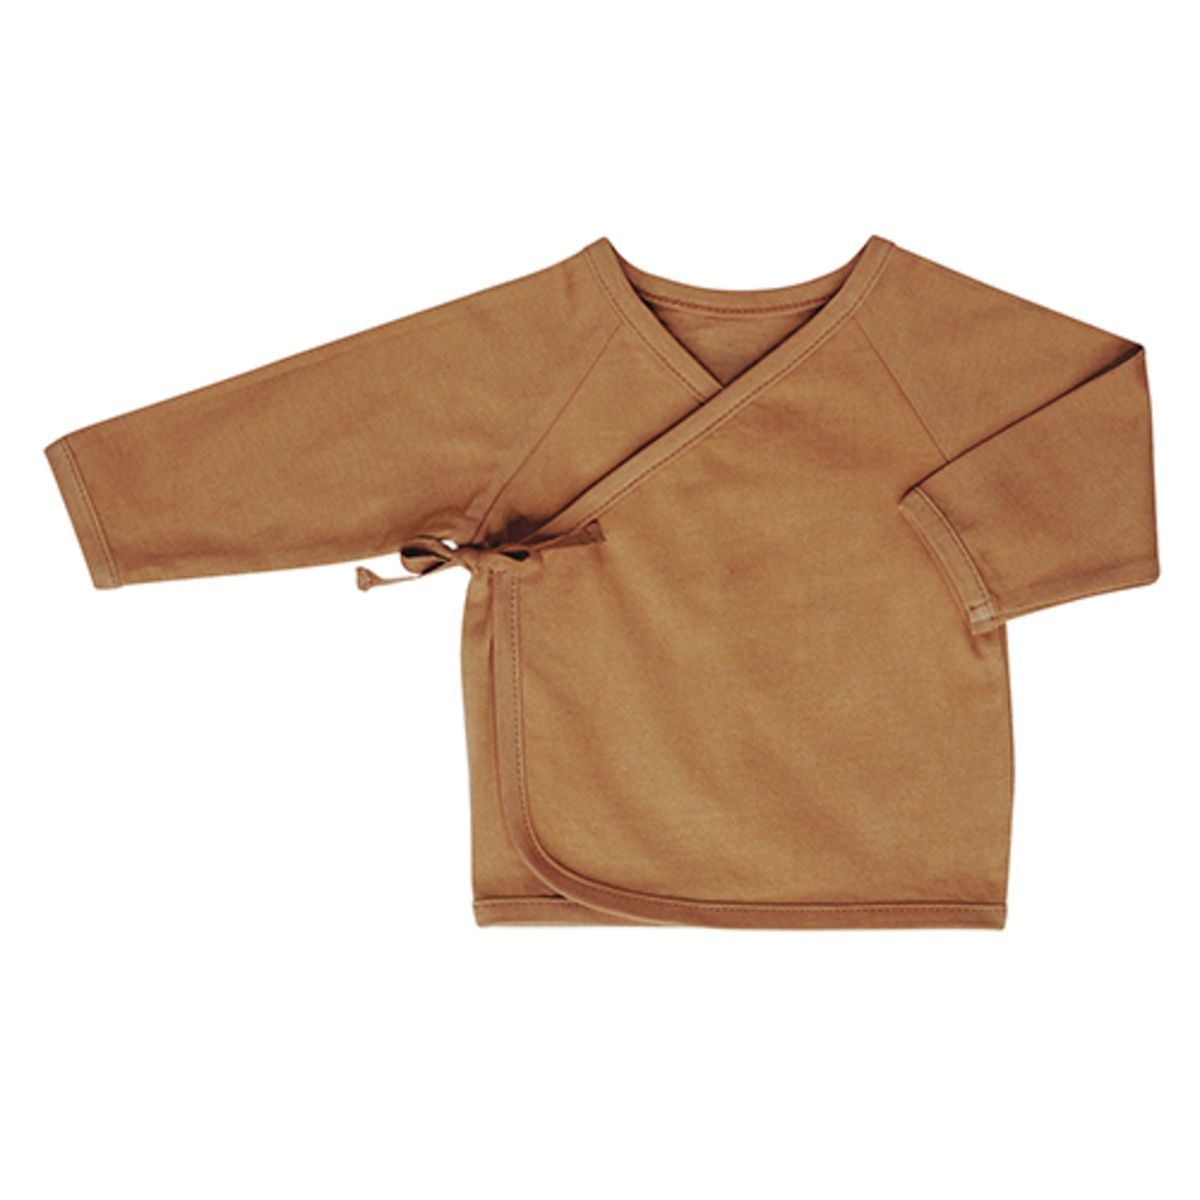 Haut bébé Cardigan Kimono Nut - 3 Mois